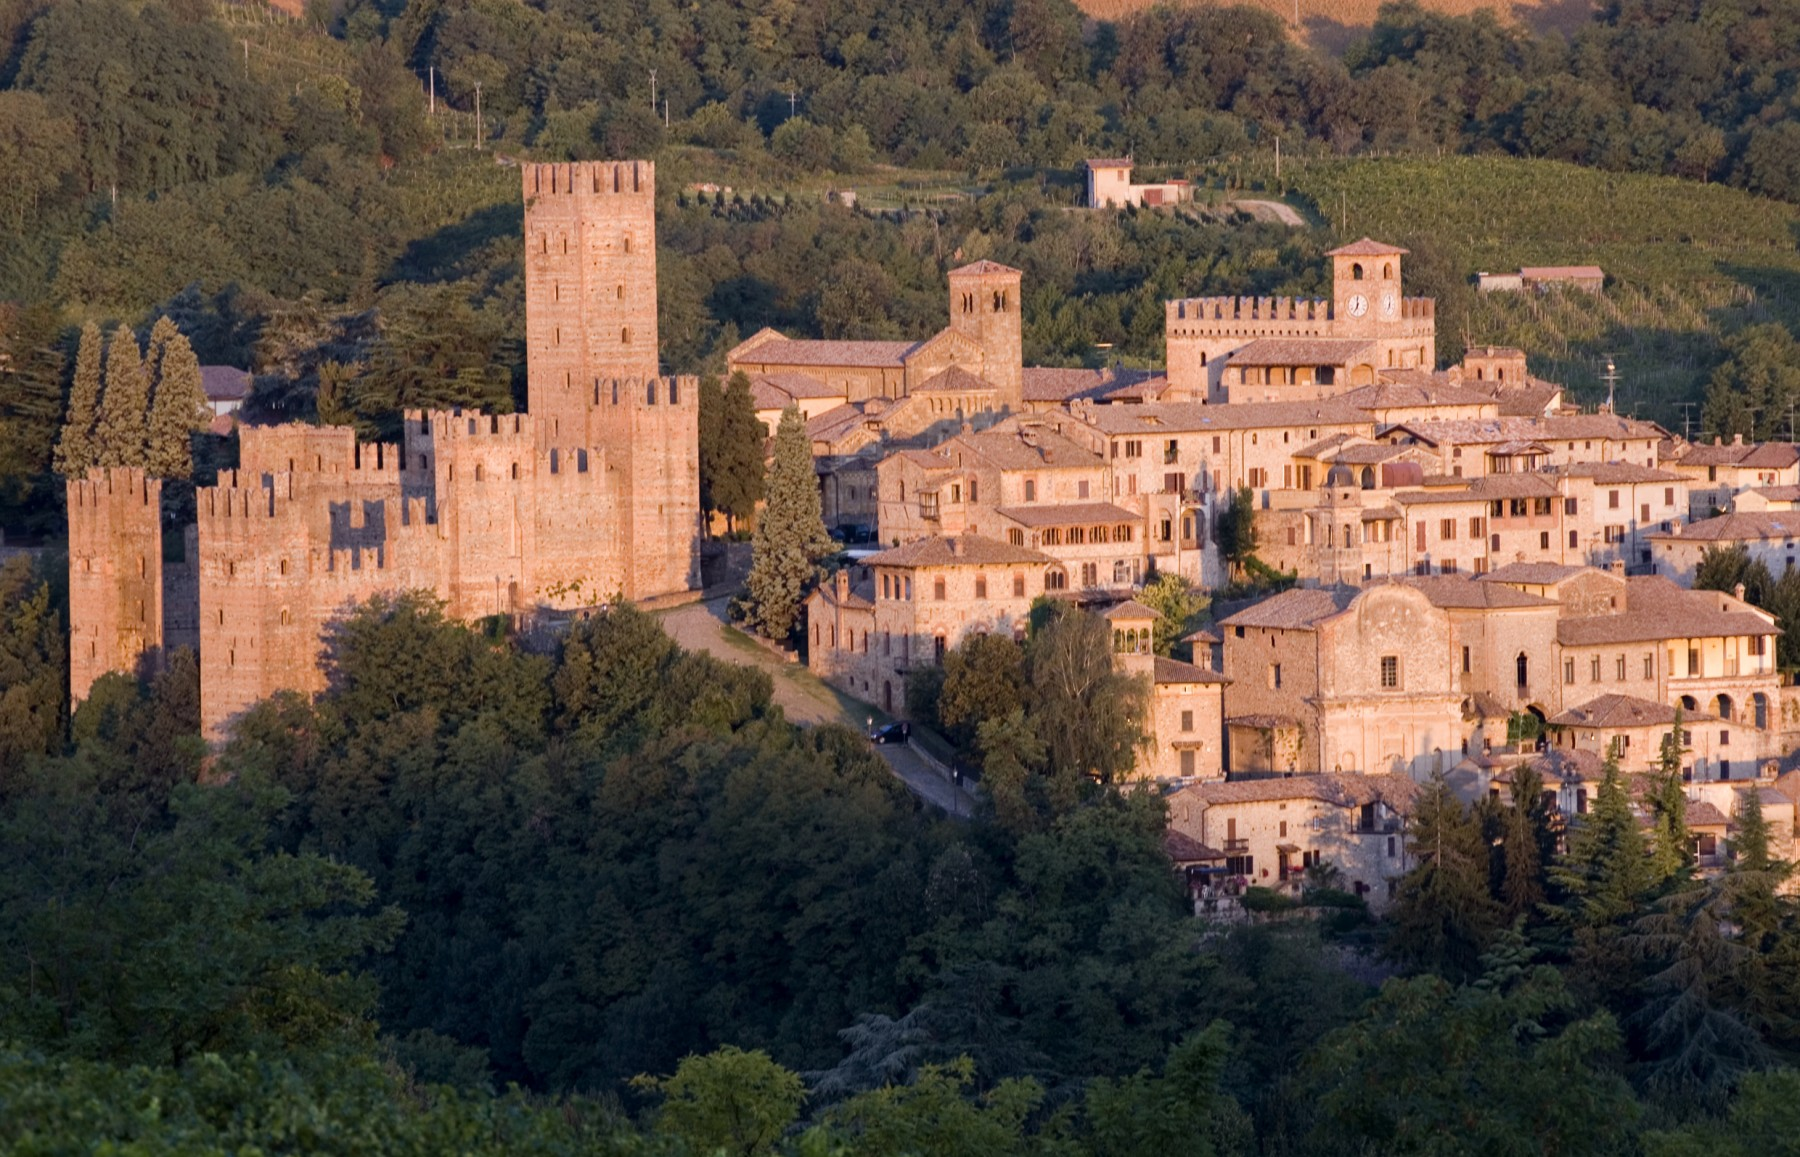 Castell'Arquato: medioevo tra i vigneti